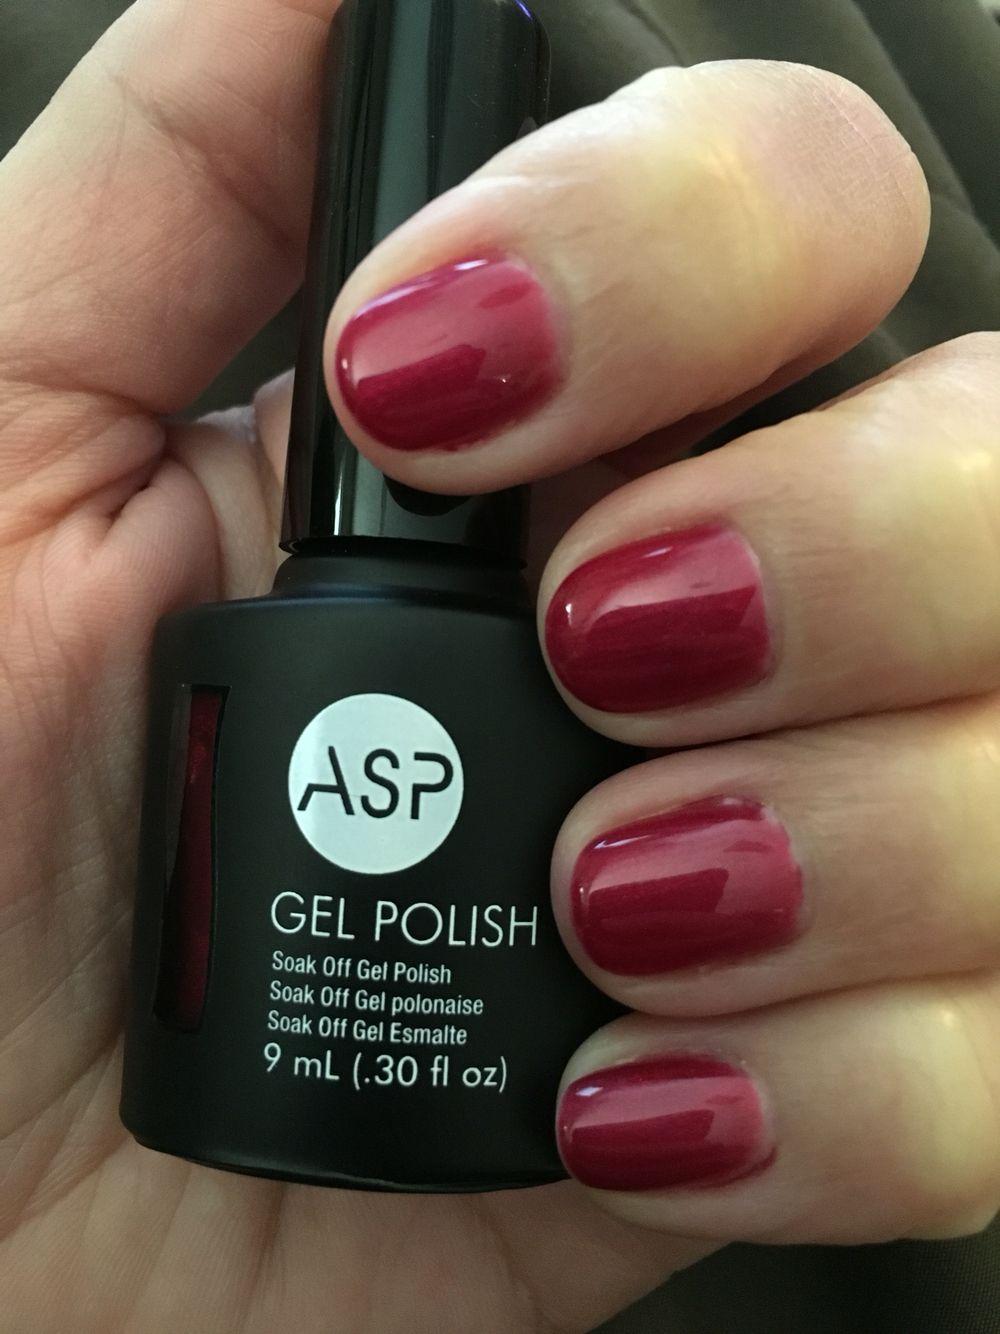 ASP Gel Polish Brooding in Burgundy | Nails | Pinterest